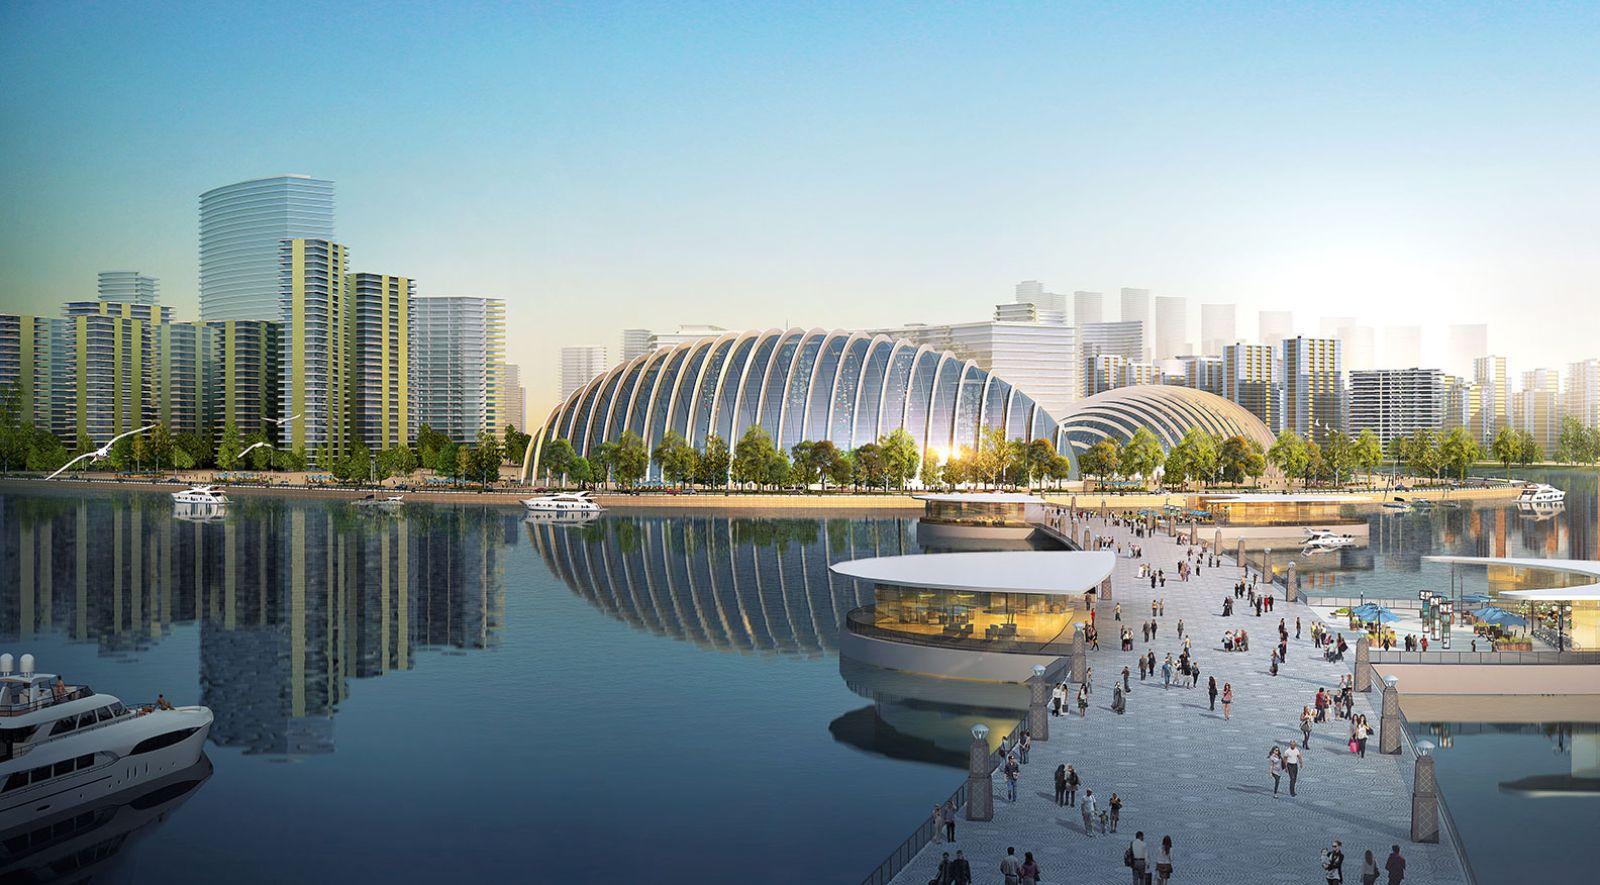 Ravi Urban Project will be showcased in Dubai Expo